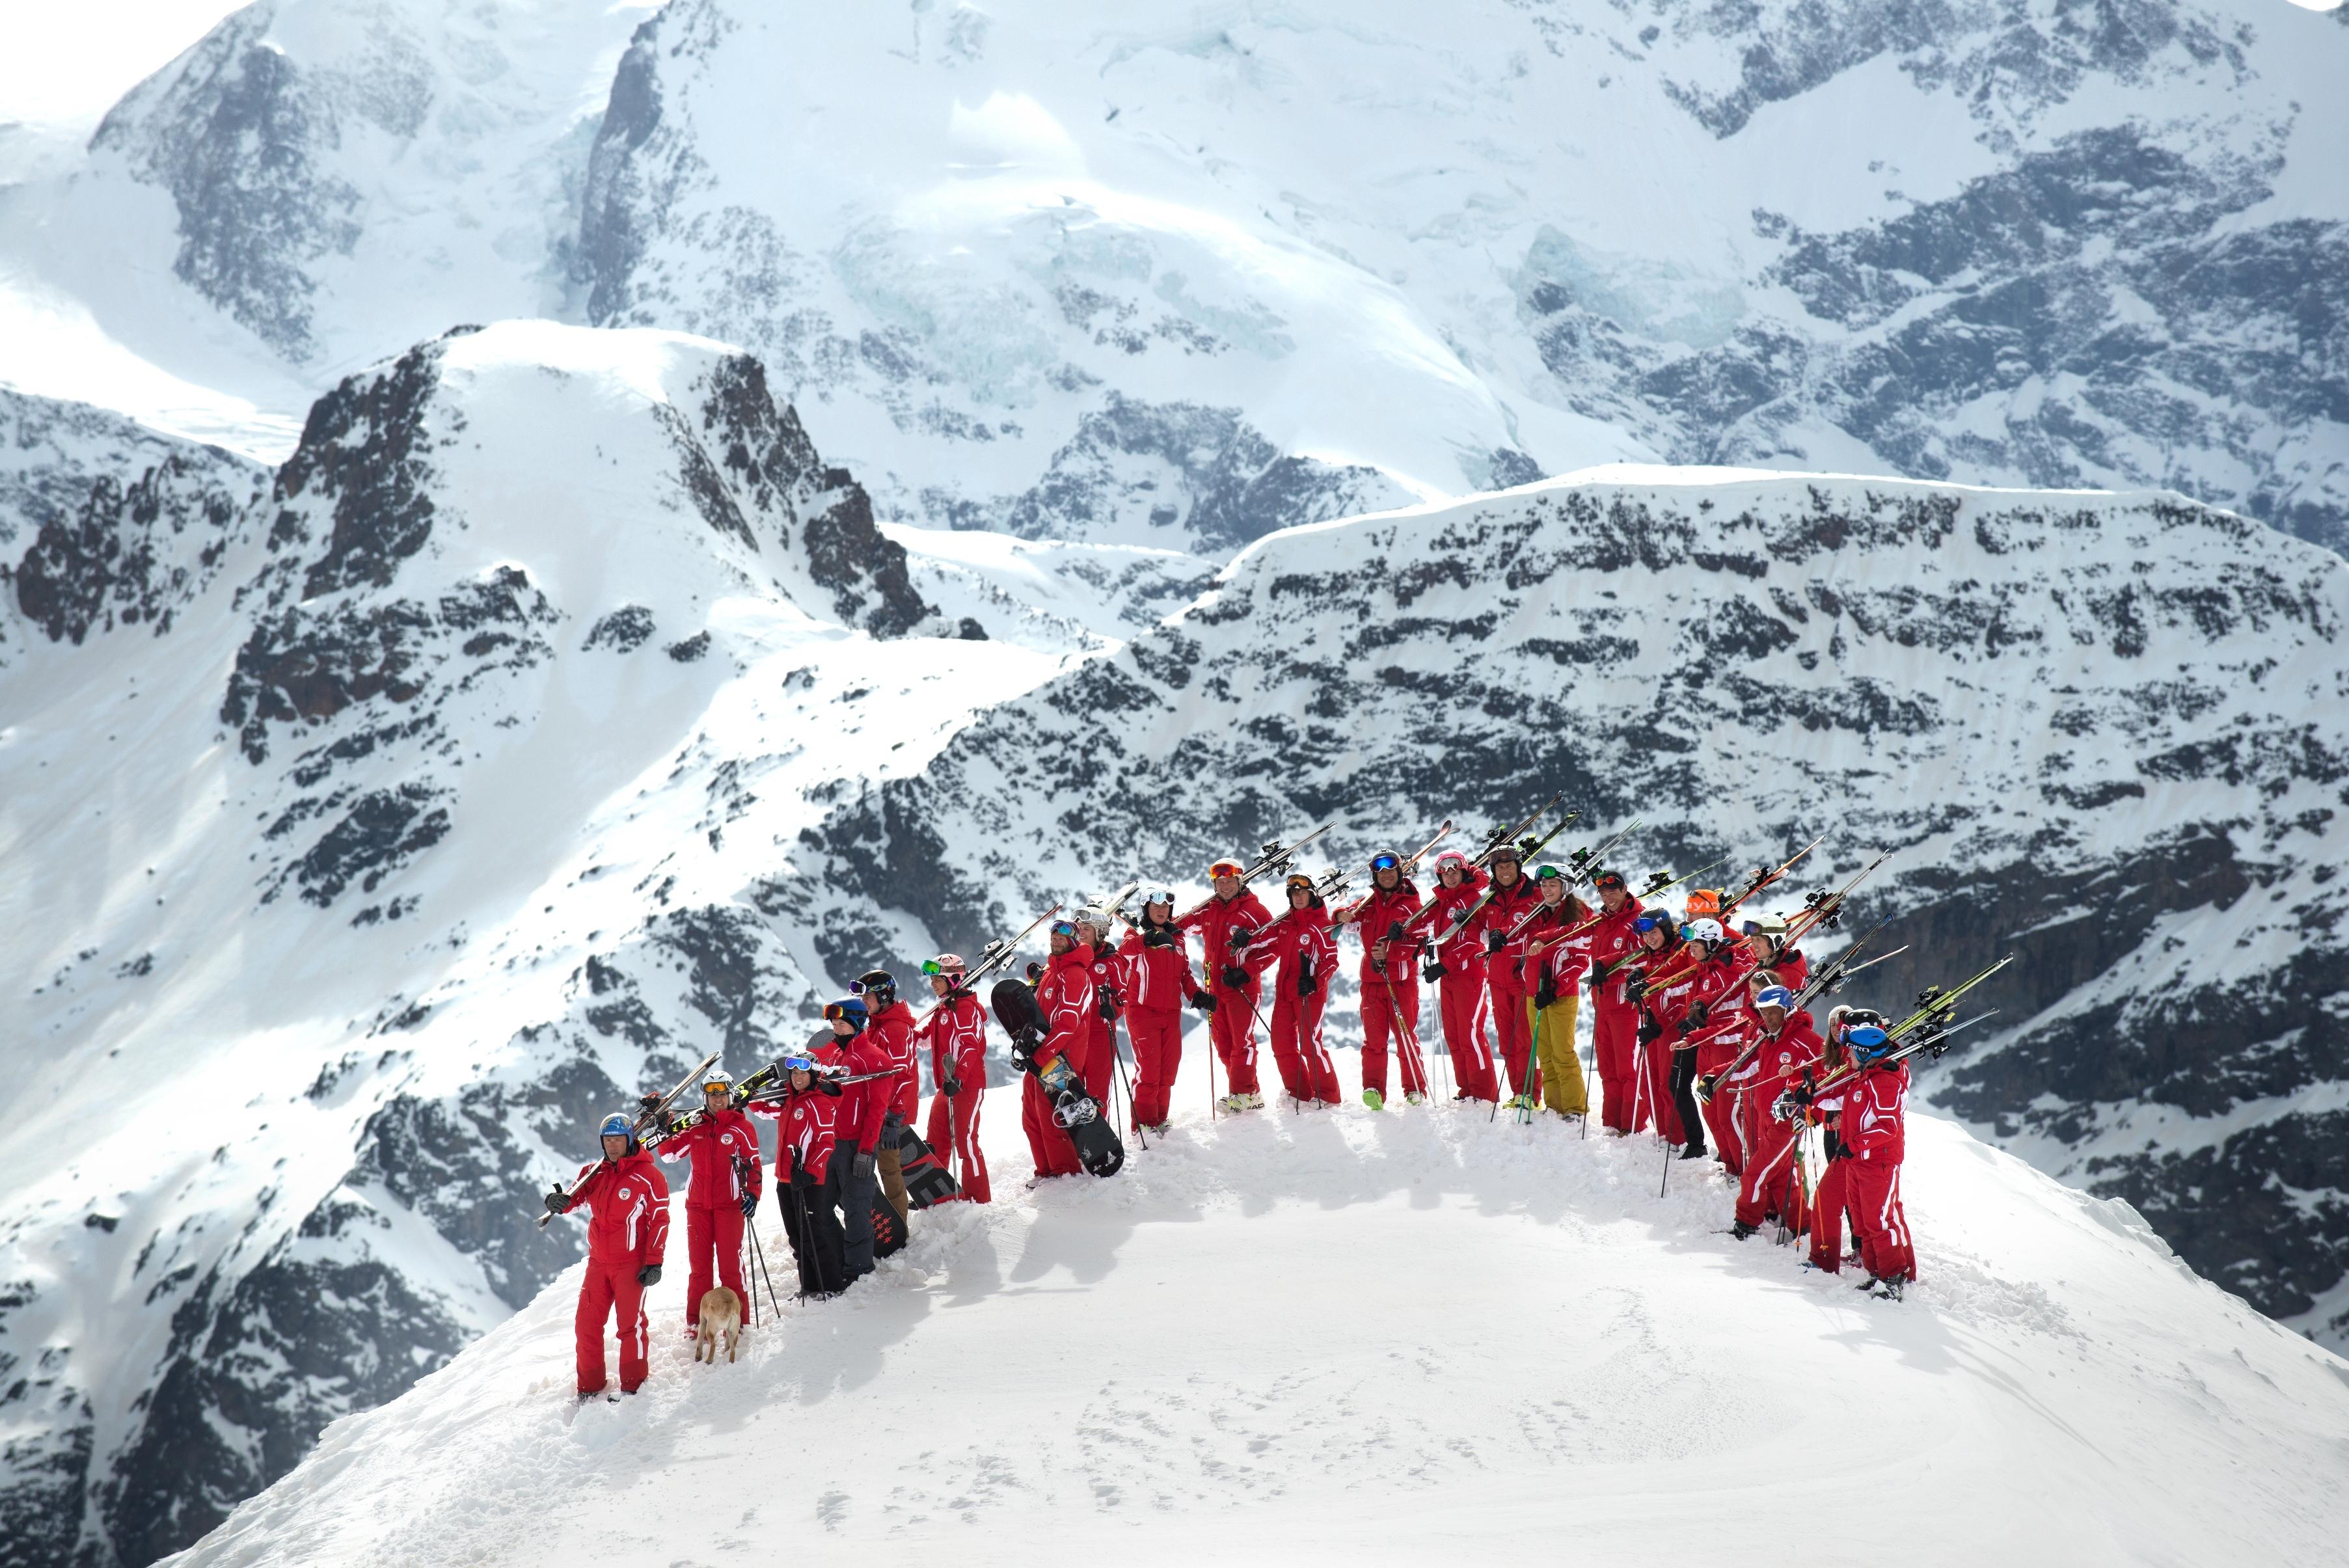 Schweizer Skischule Corvatsch-Pontresina AG Slide 2